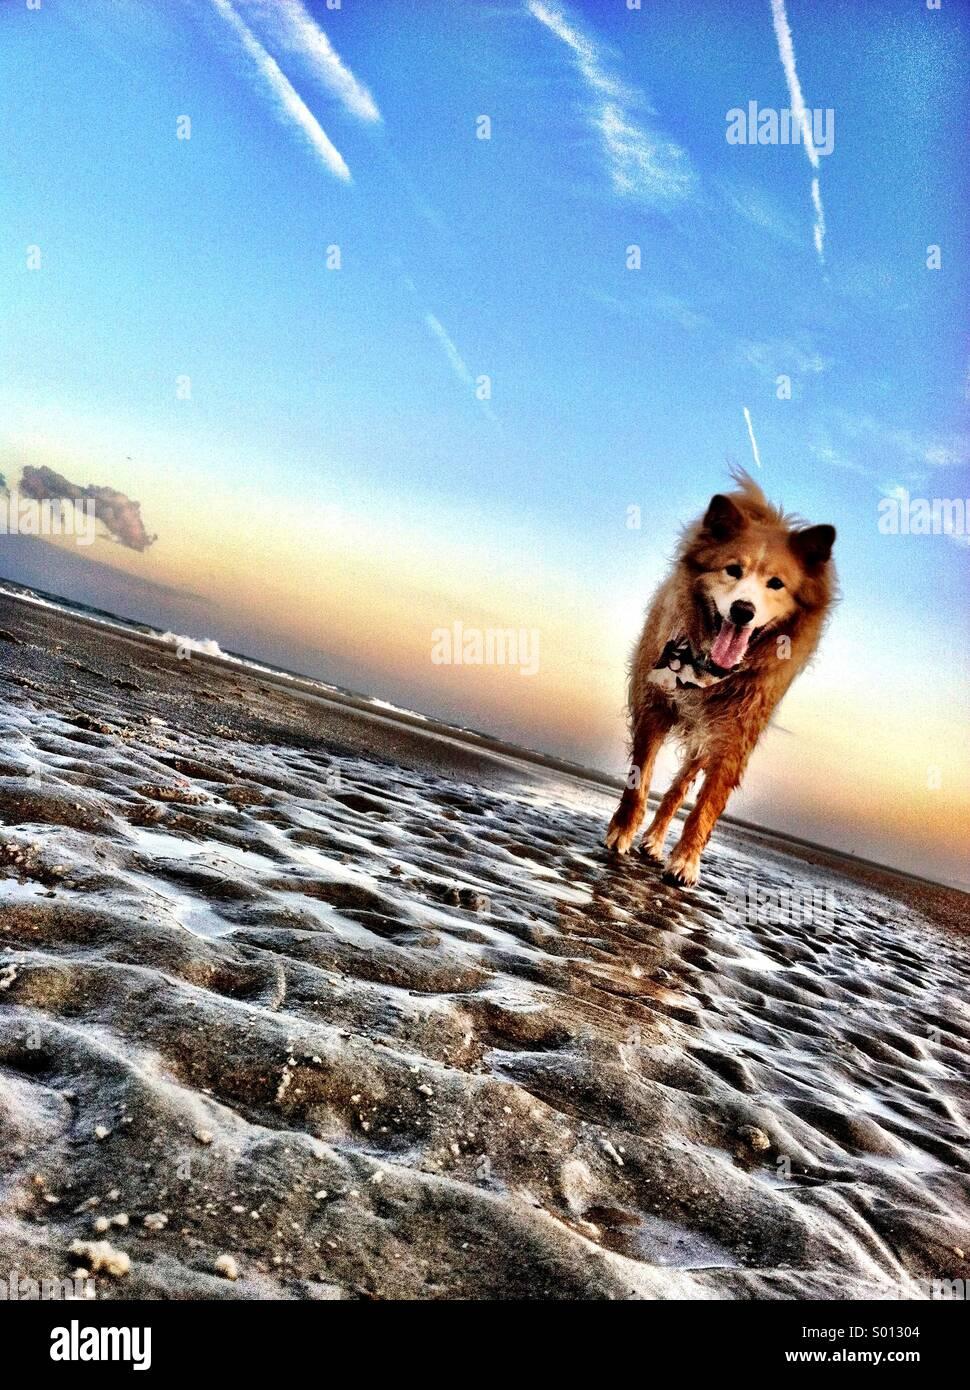 Dog on Beach - Stock Image